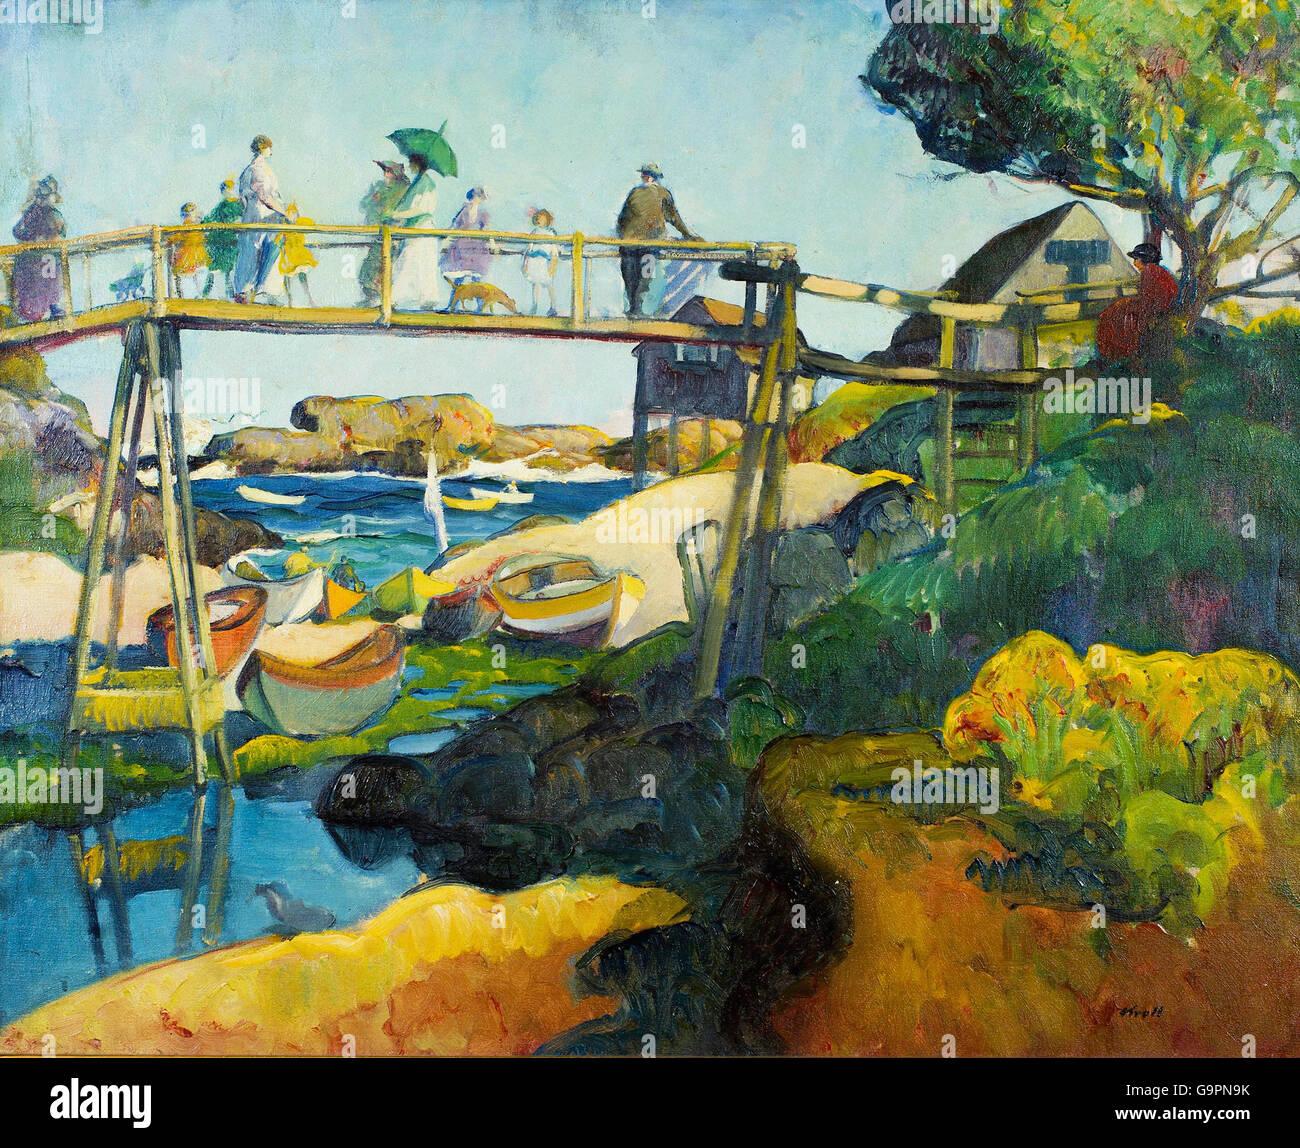 Leon Kroll - The Gay Bridge - Stock Image